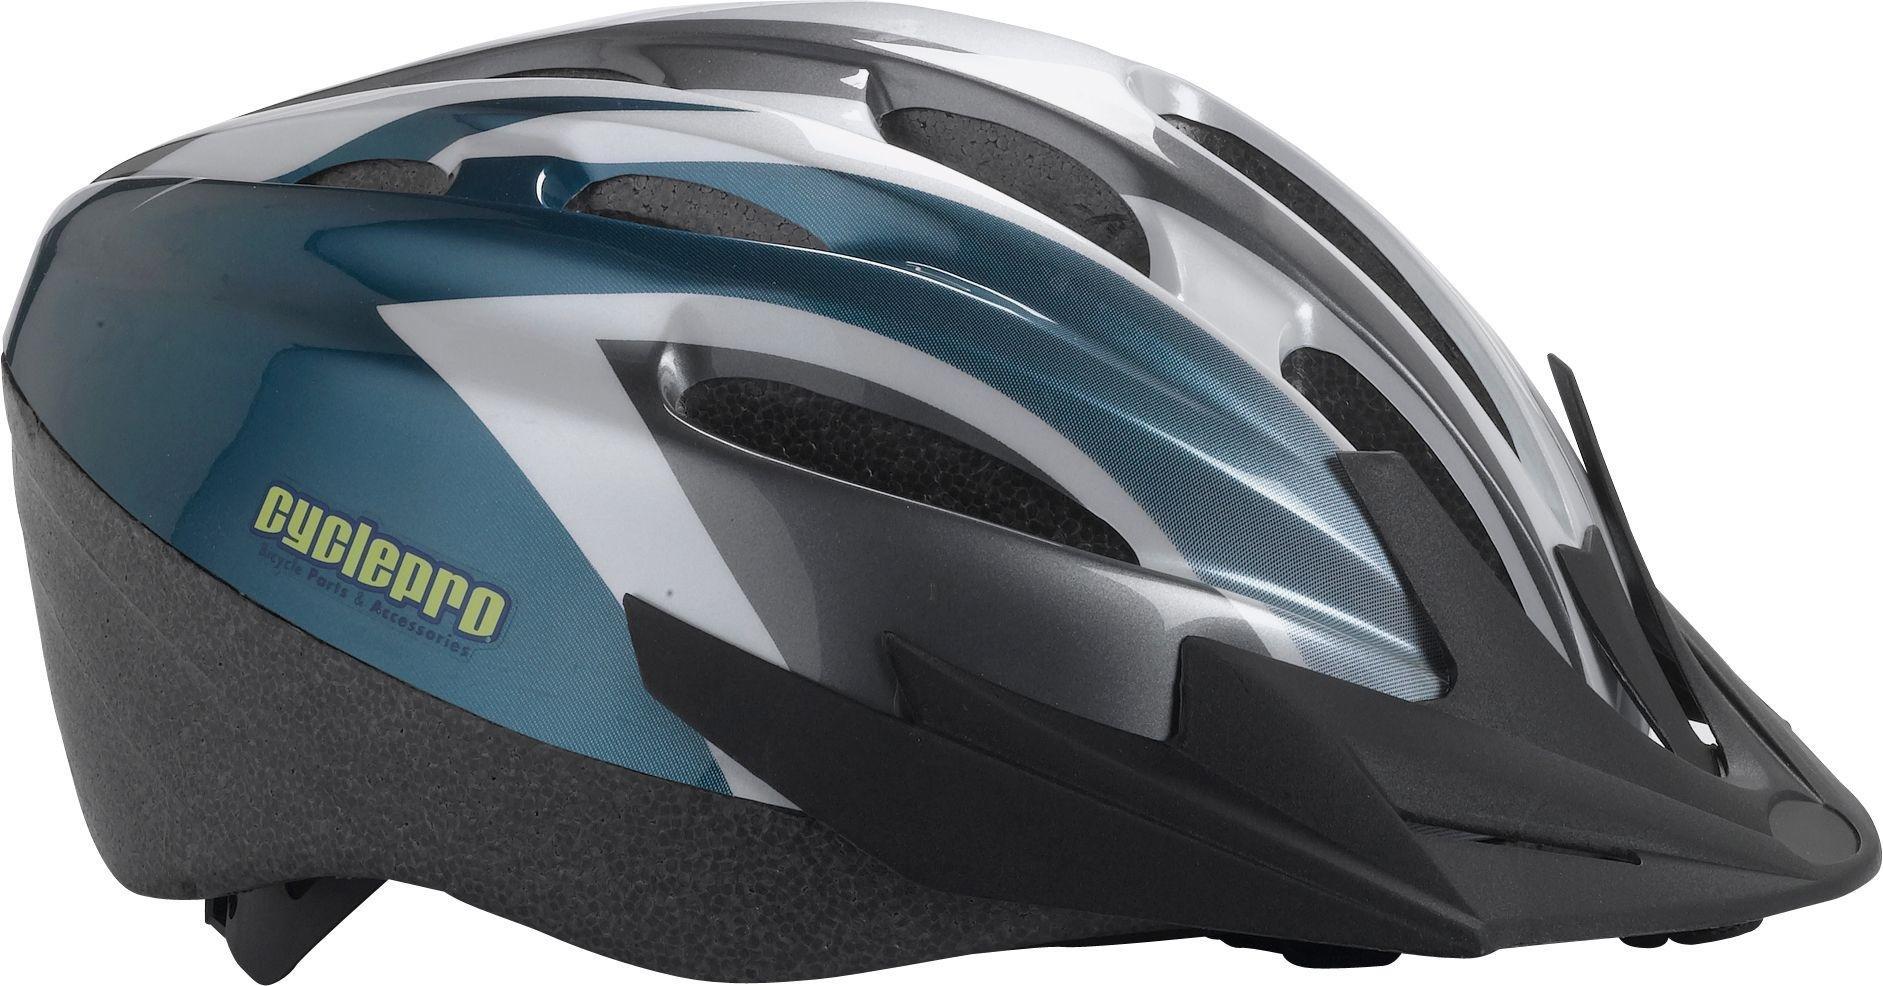 Image of Cyclepro - Bike Helmet - Unisex